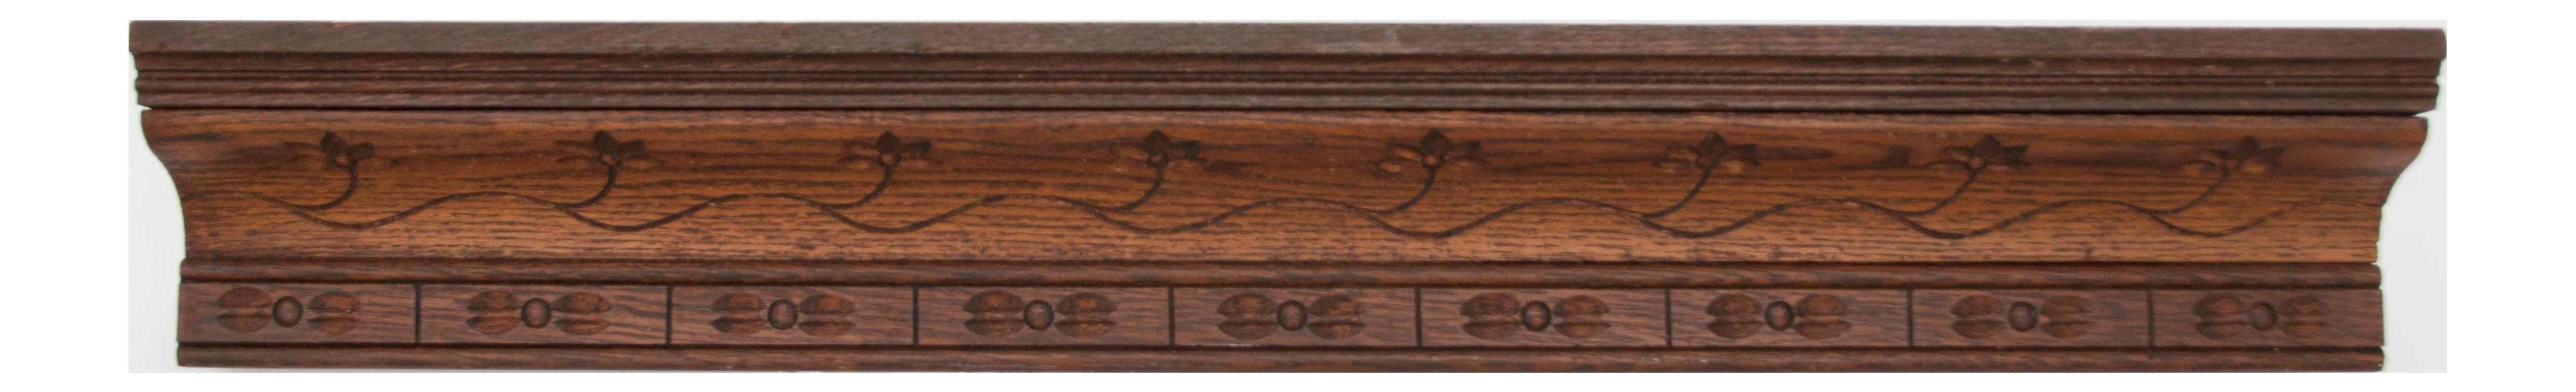 Large Antique French Carved Walnut Shelf u0026 Plate Rack  sc 1 st  Chairish & Large Antique French Carved Walnut Shelf u0026 Plate Rack | Chairish